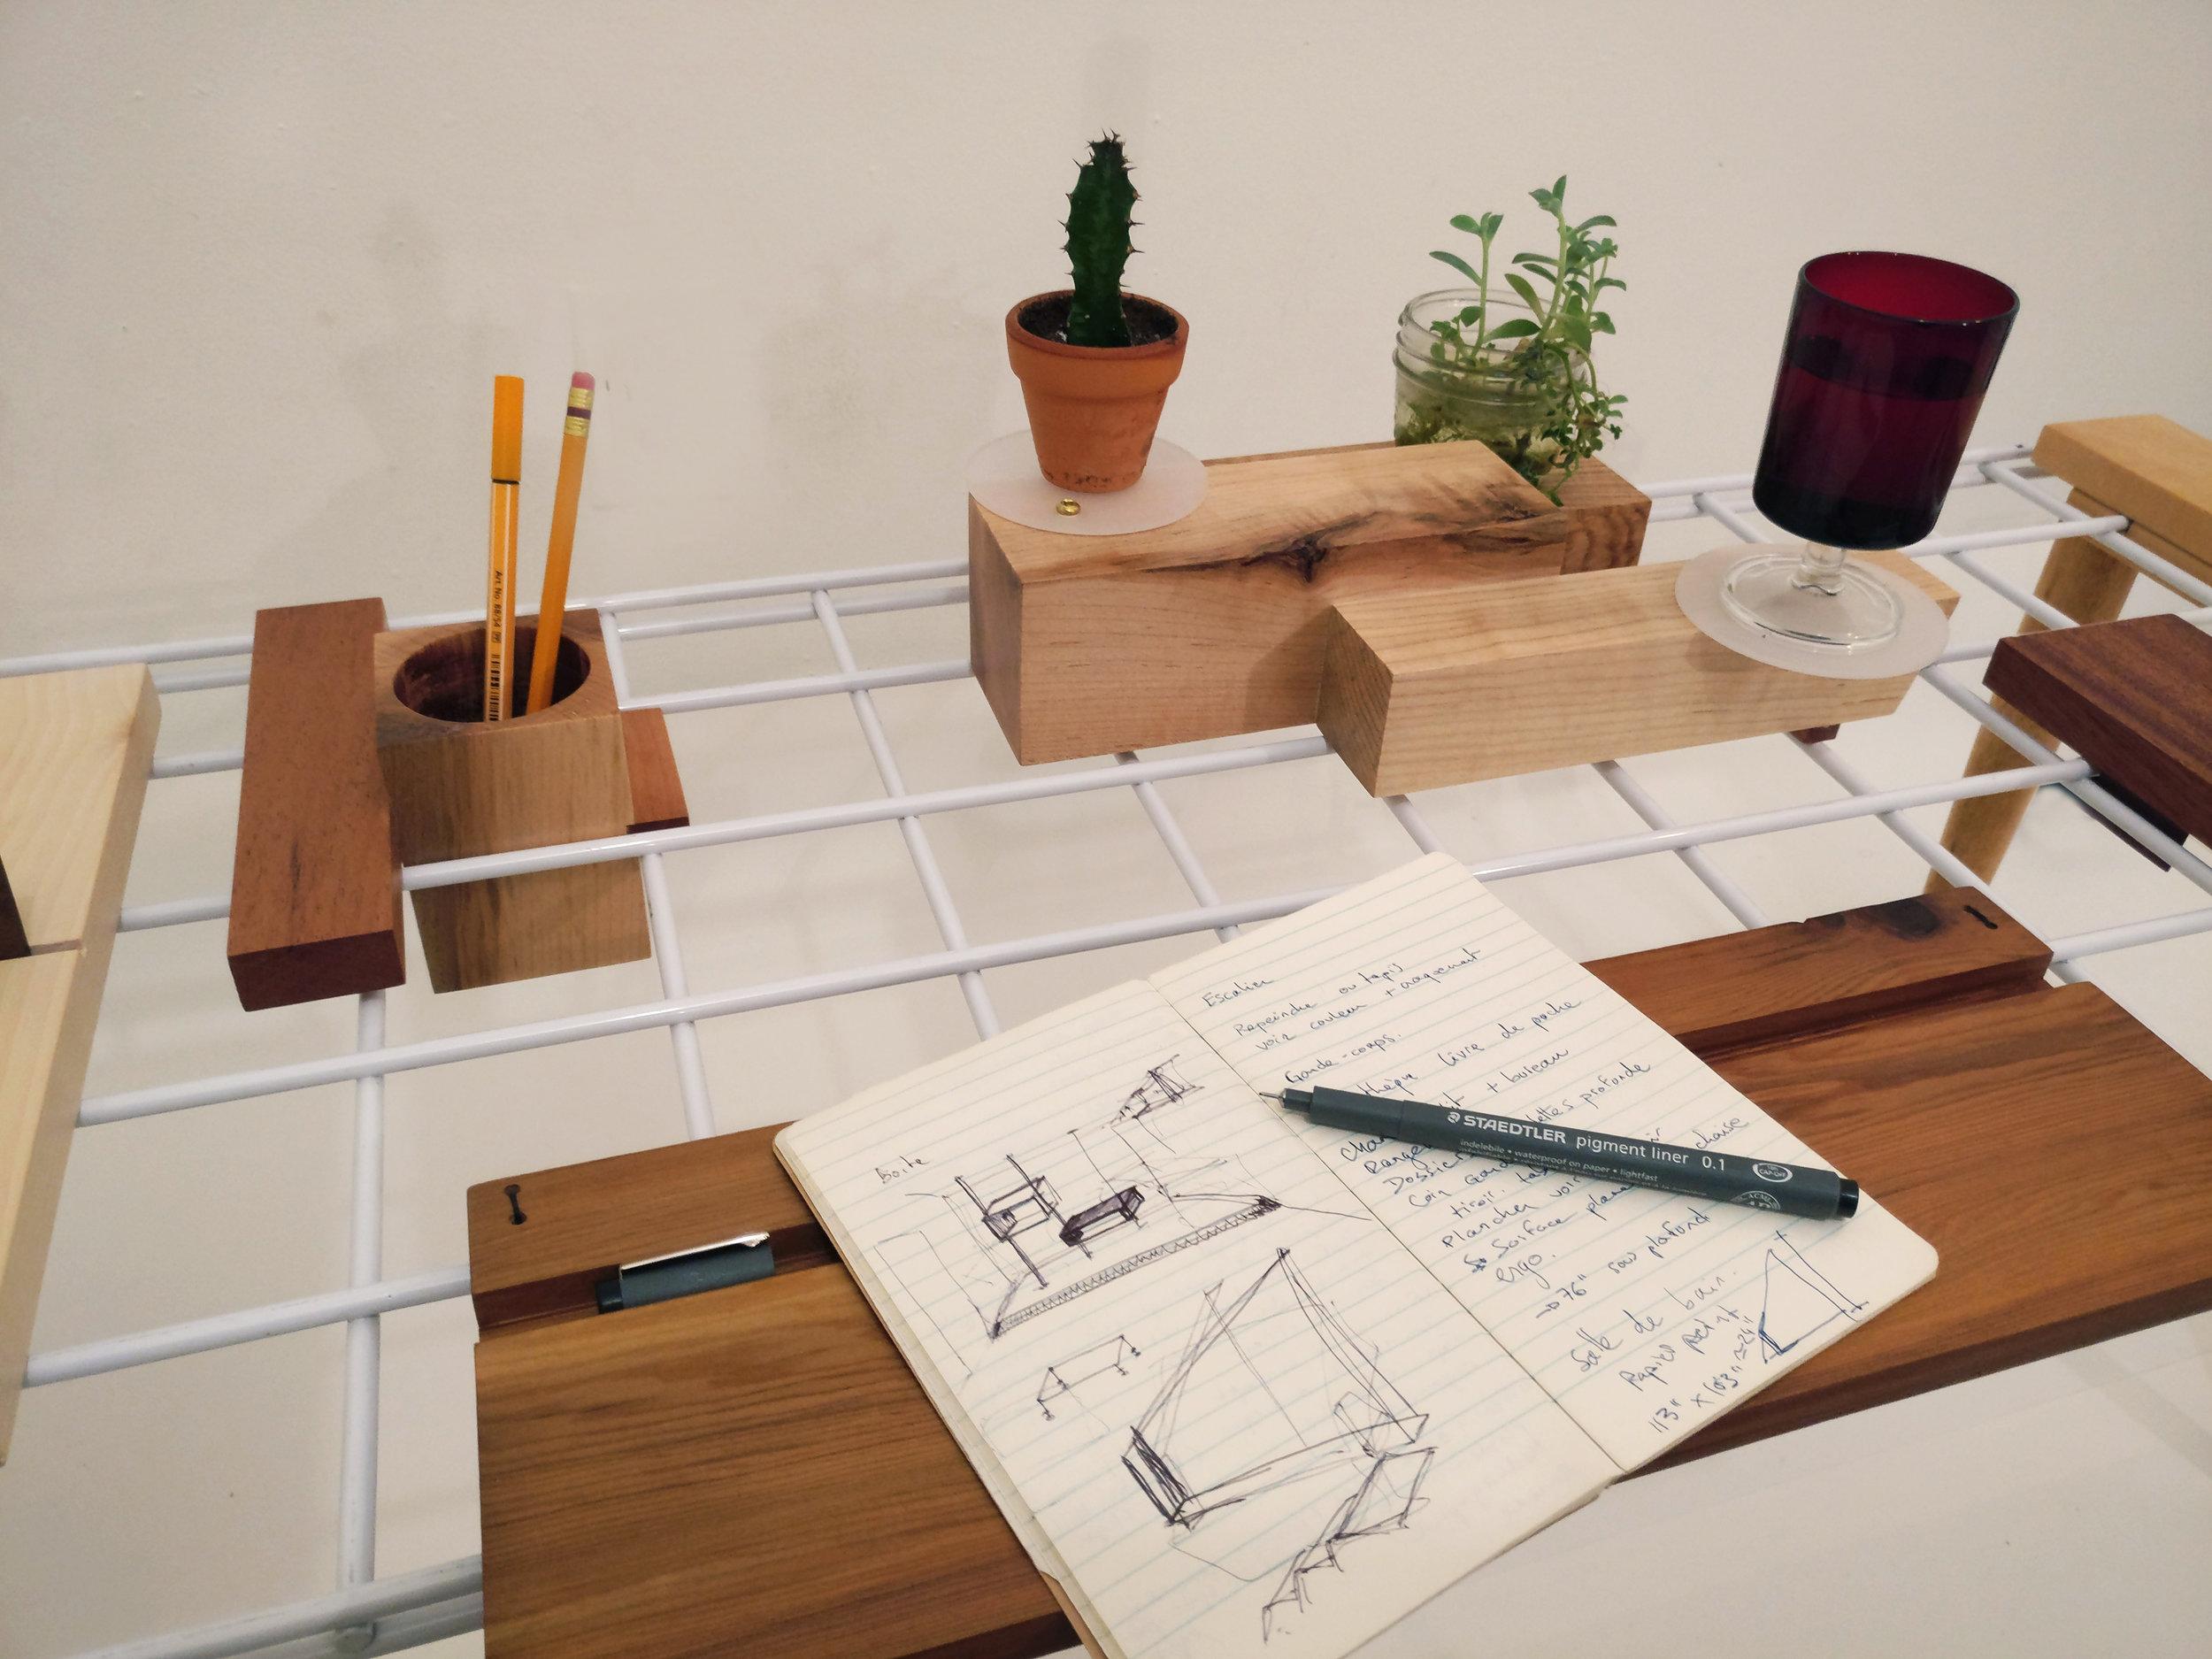 Nuvem coffee table, projecteighteight, designer, myriam rigaud, wood design, design object